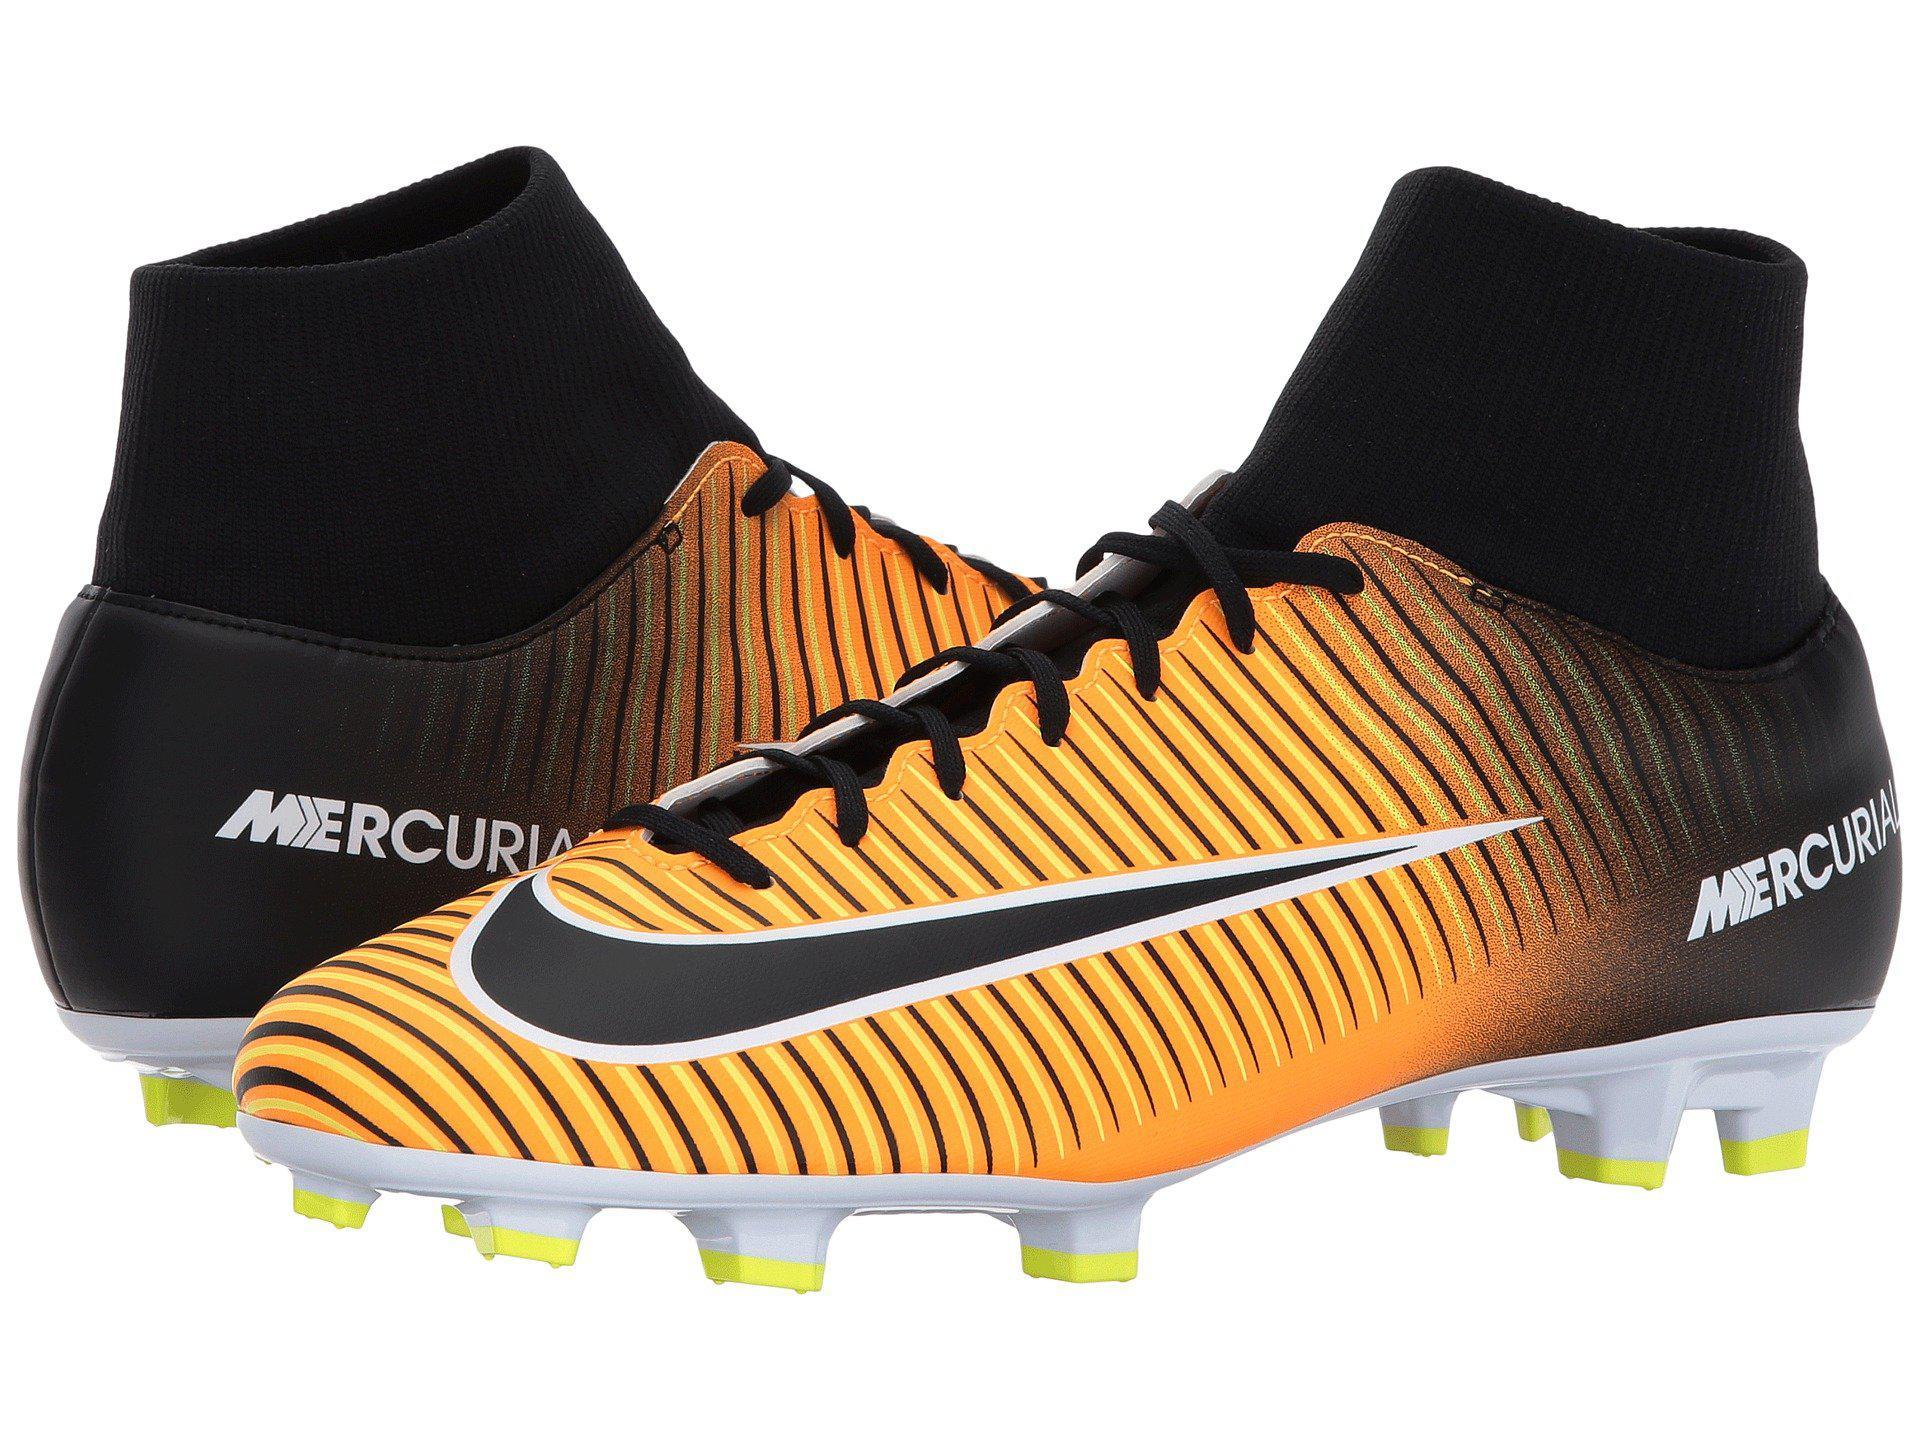 d0c167f2645db Lyst - Nike Mercurial Victory Vi Dynamic Fit Fg in Orange for Men